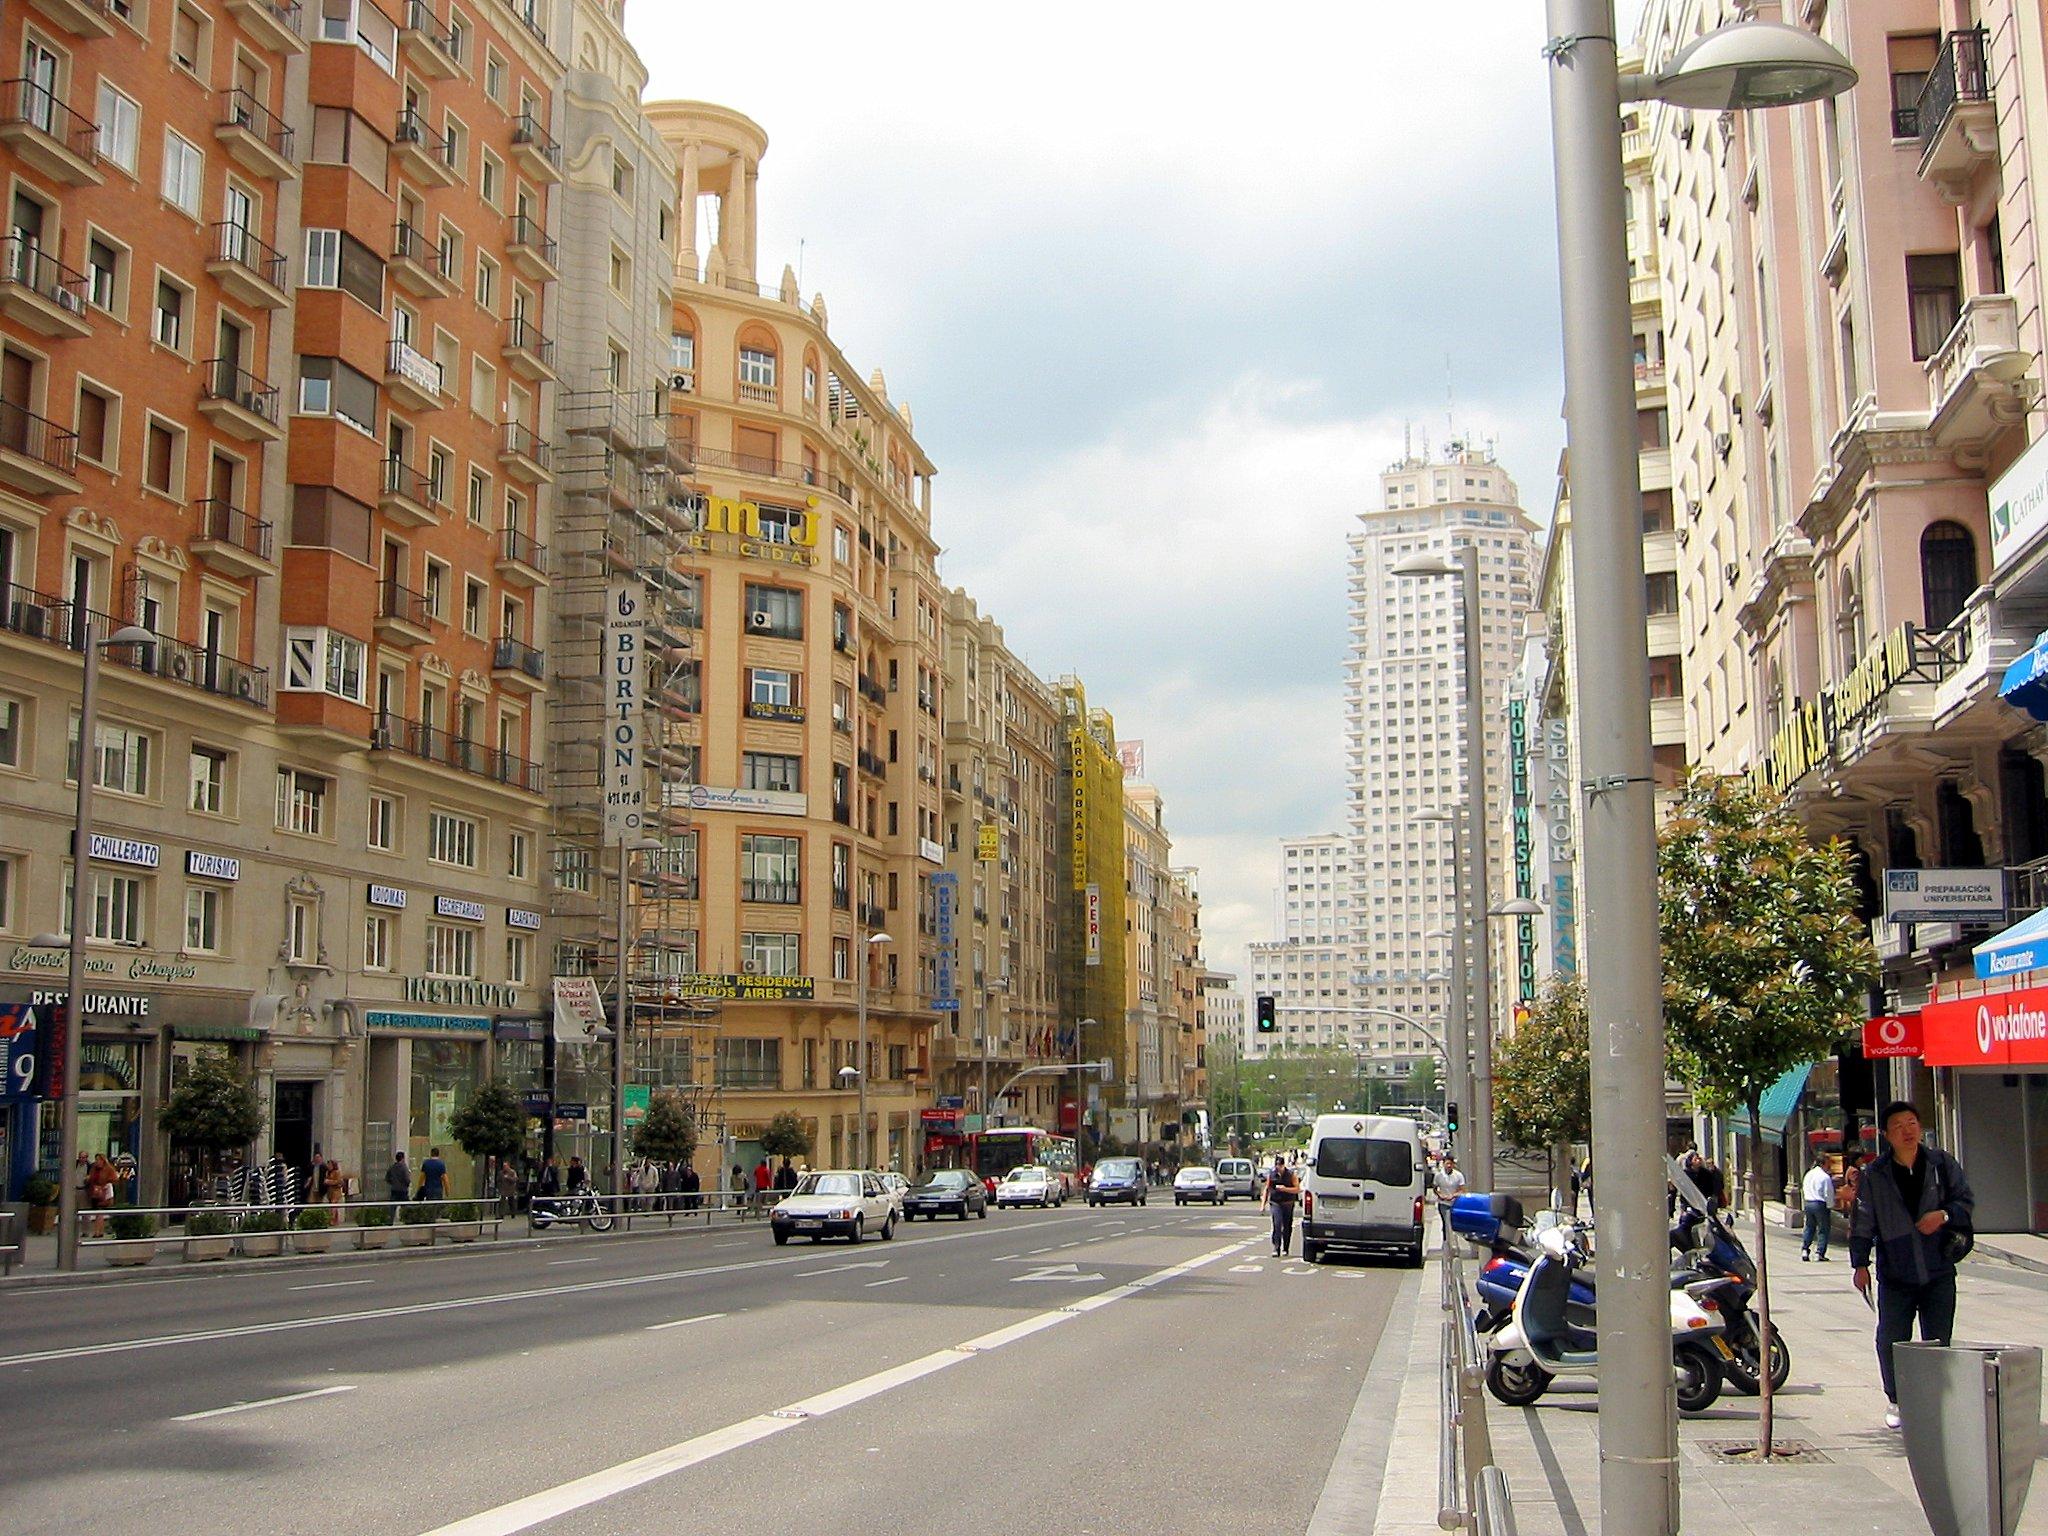 Gran v a evacuated due to bomb scare - Calle castello madrid ...